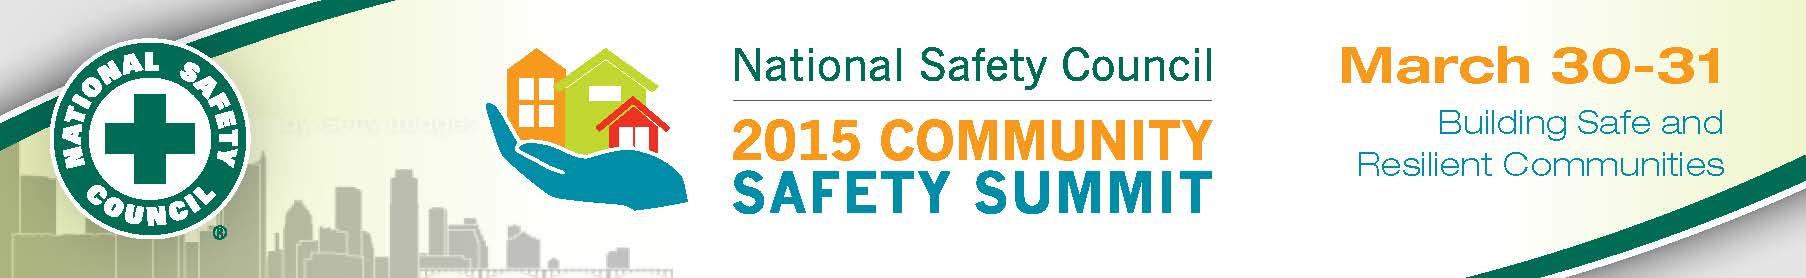 2015 Community Safety Summit